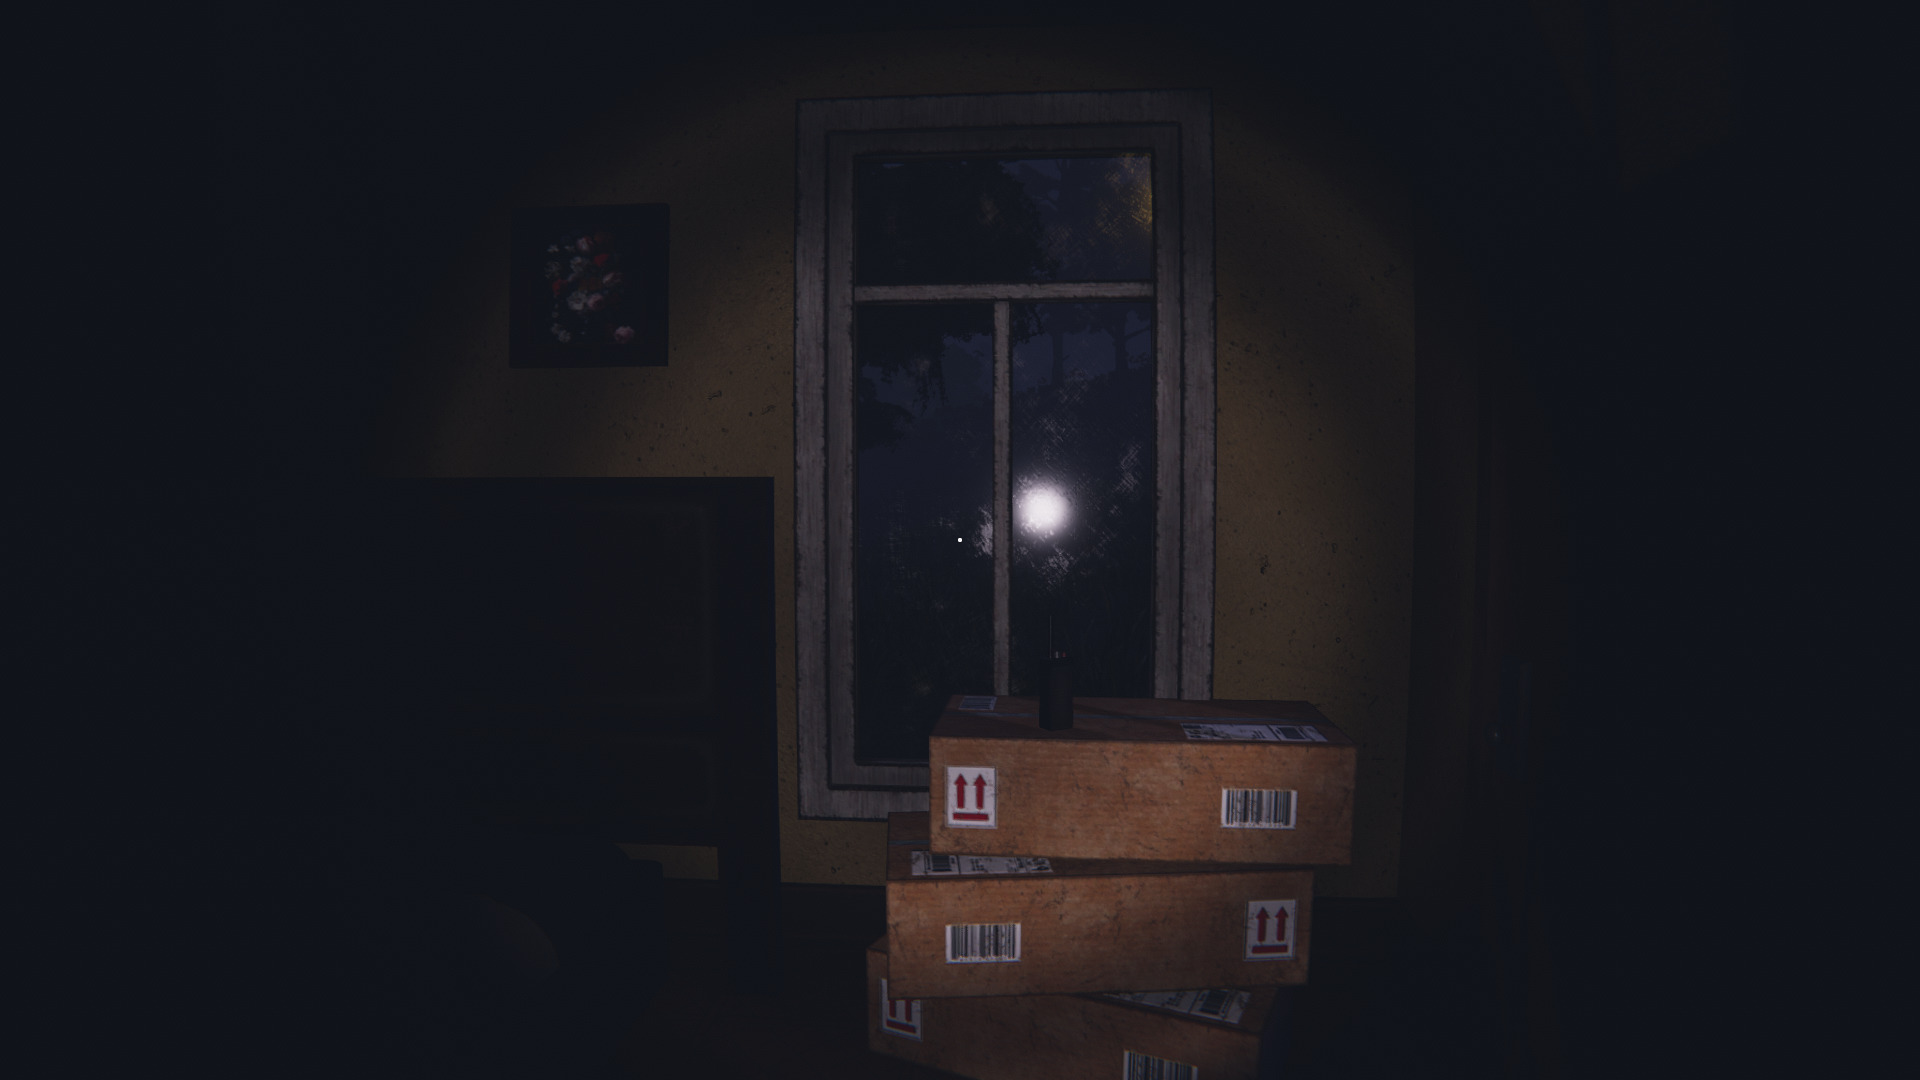 abduction-0.jpg